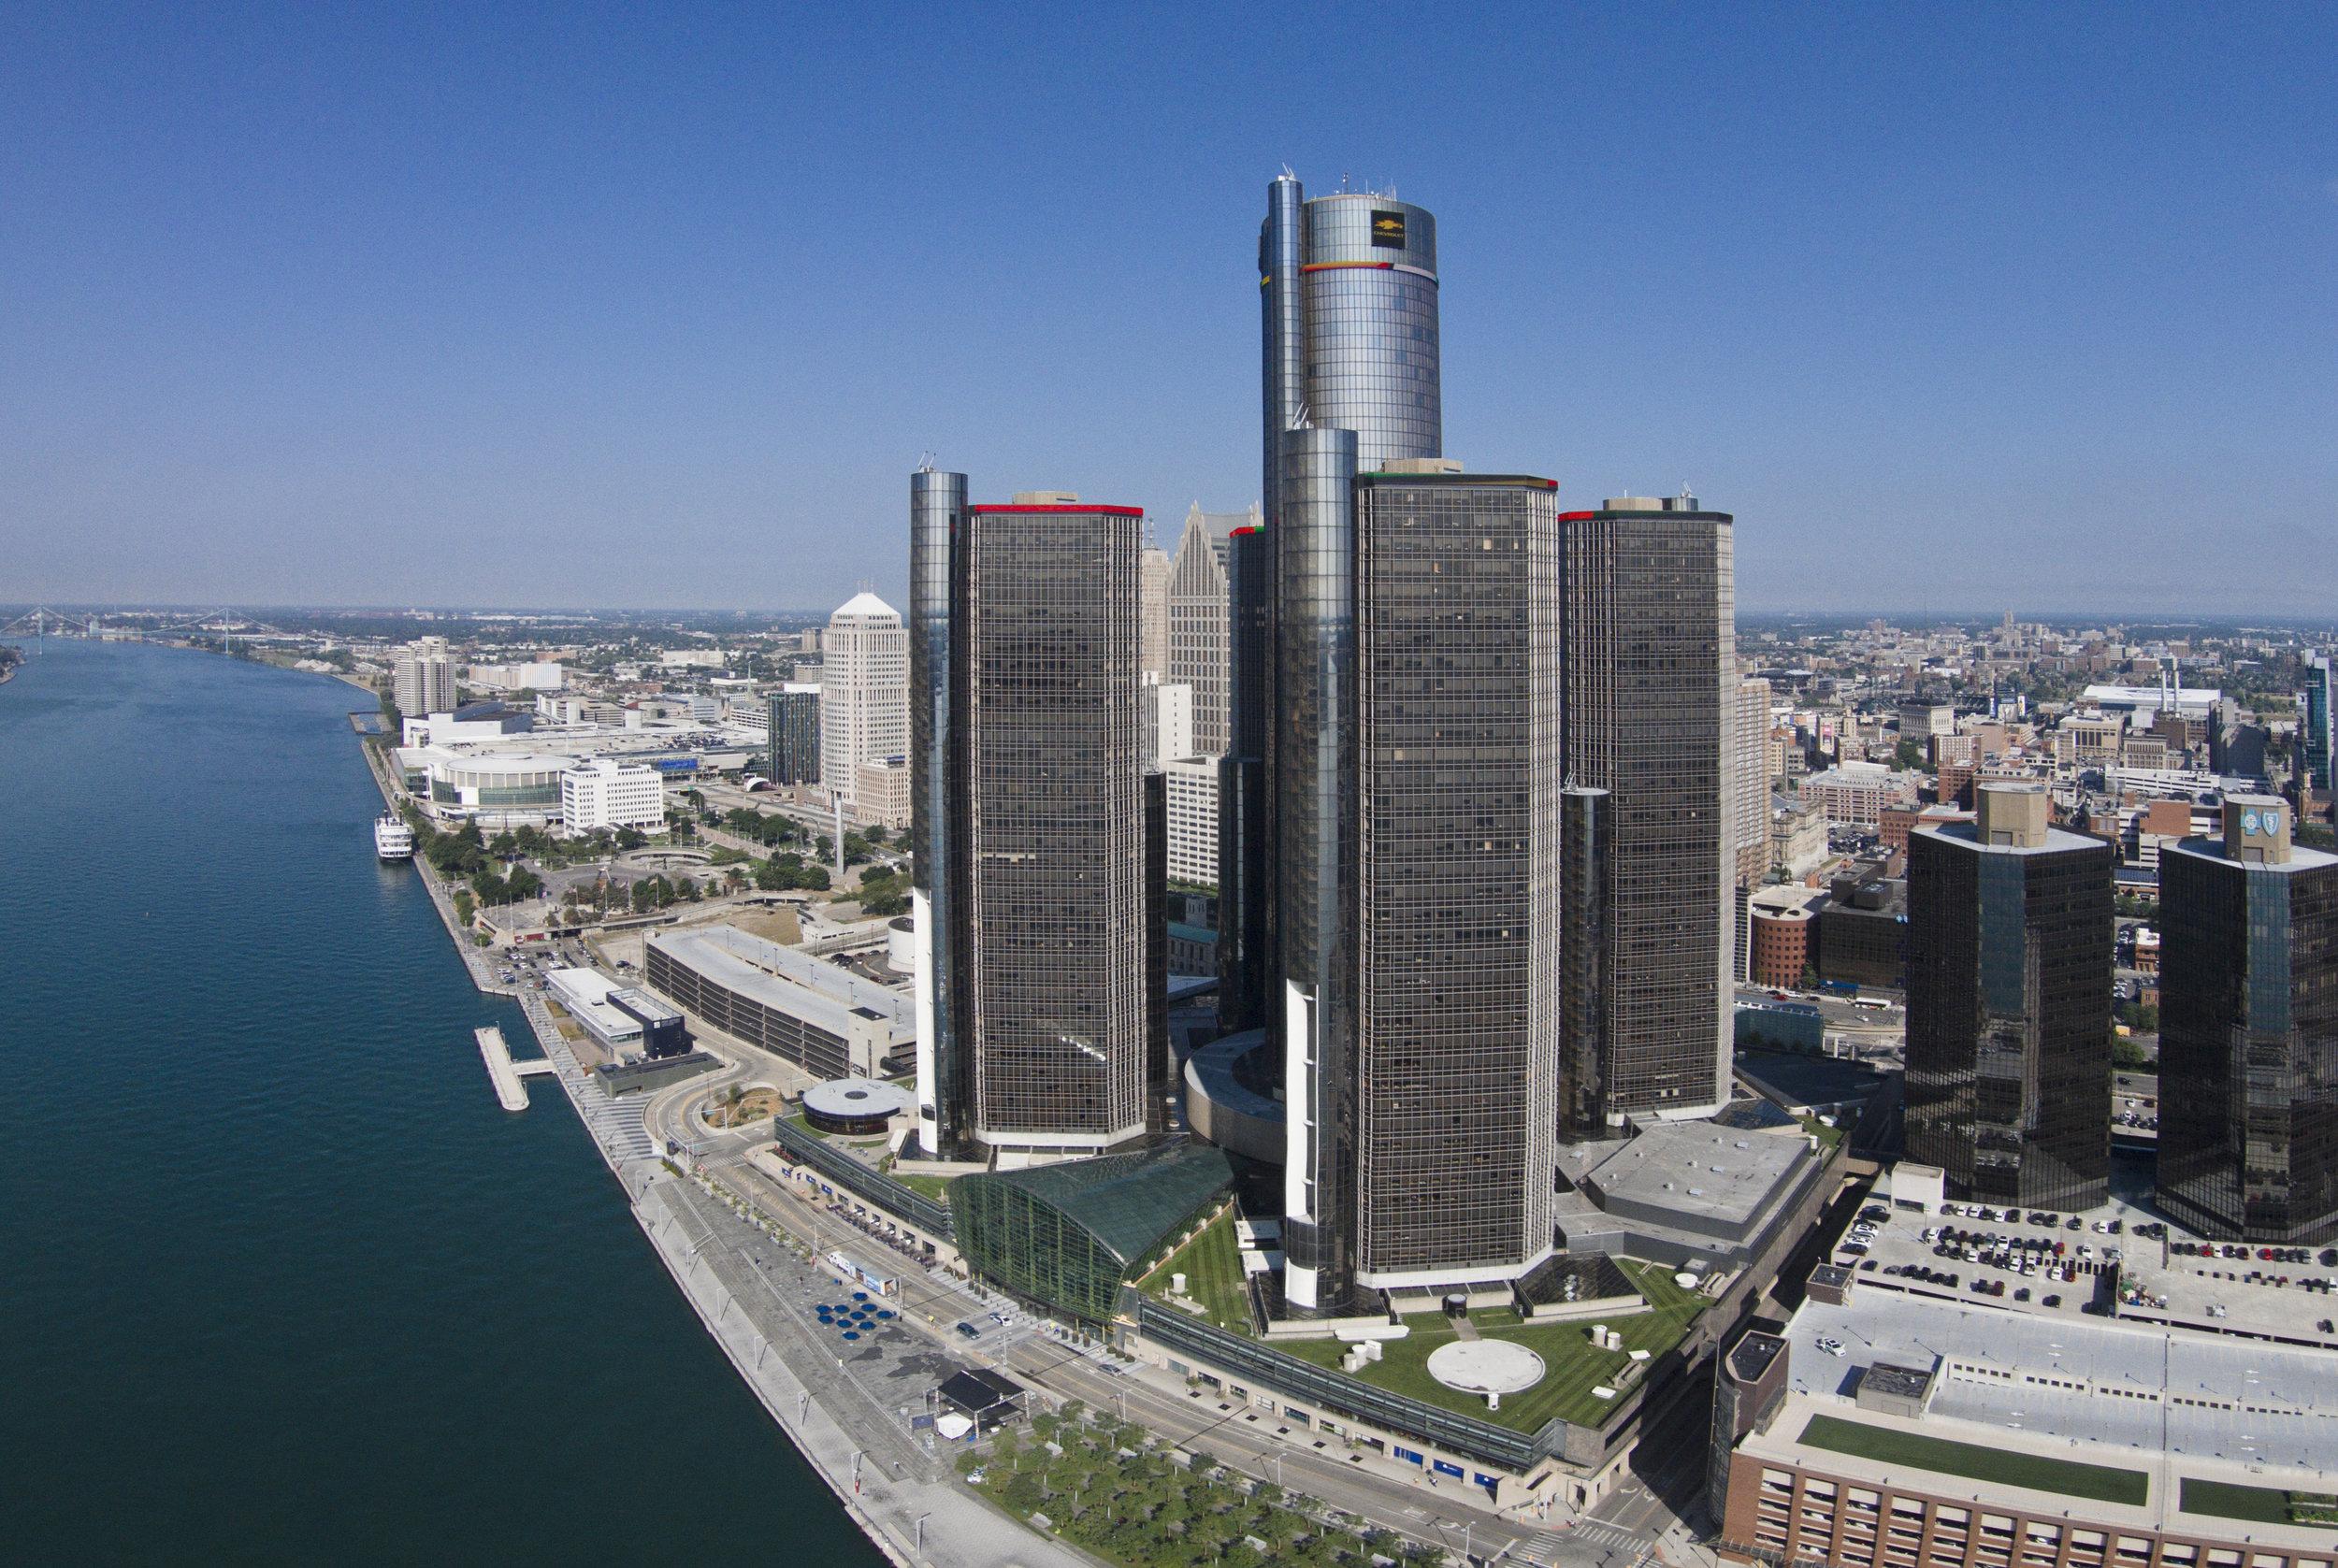 Detroit_RenCen_drone01.jpg